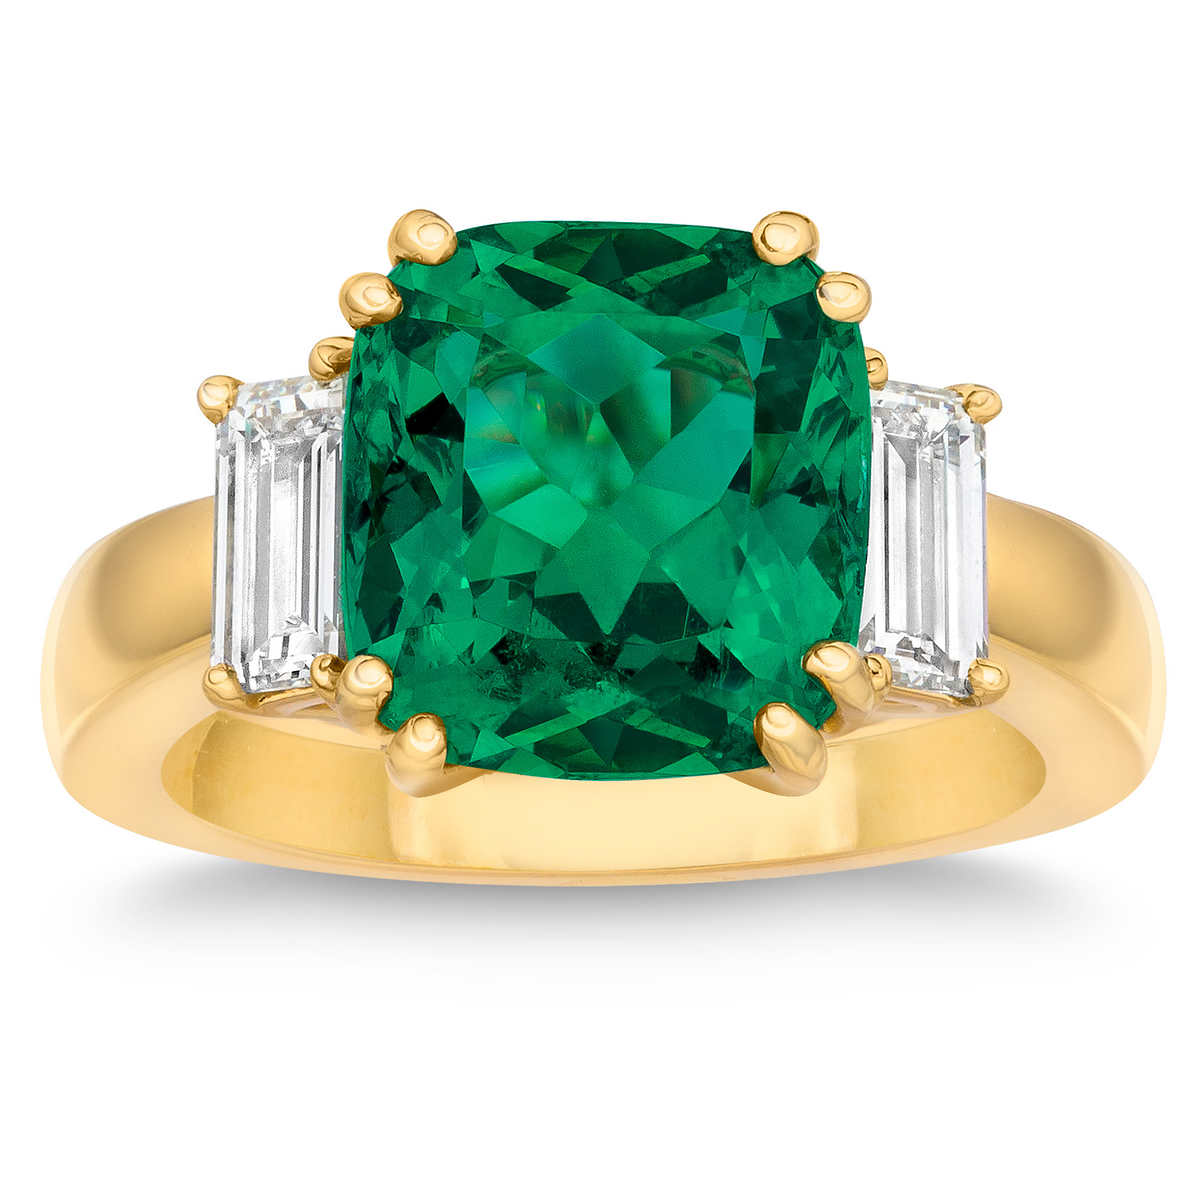 0a732743345e04 Cushion Cut Emerald Diamond 18kt Yellow Gold Ring